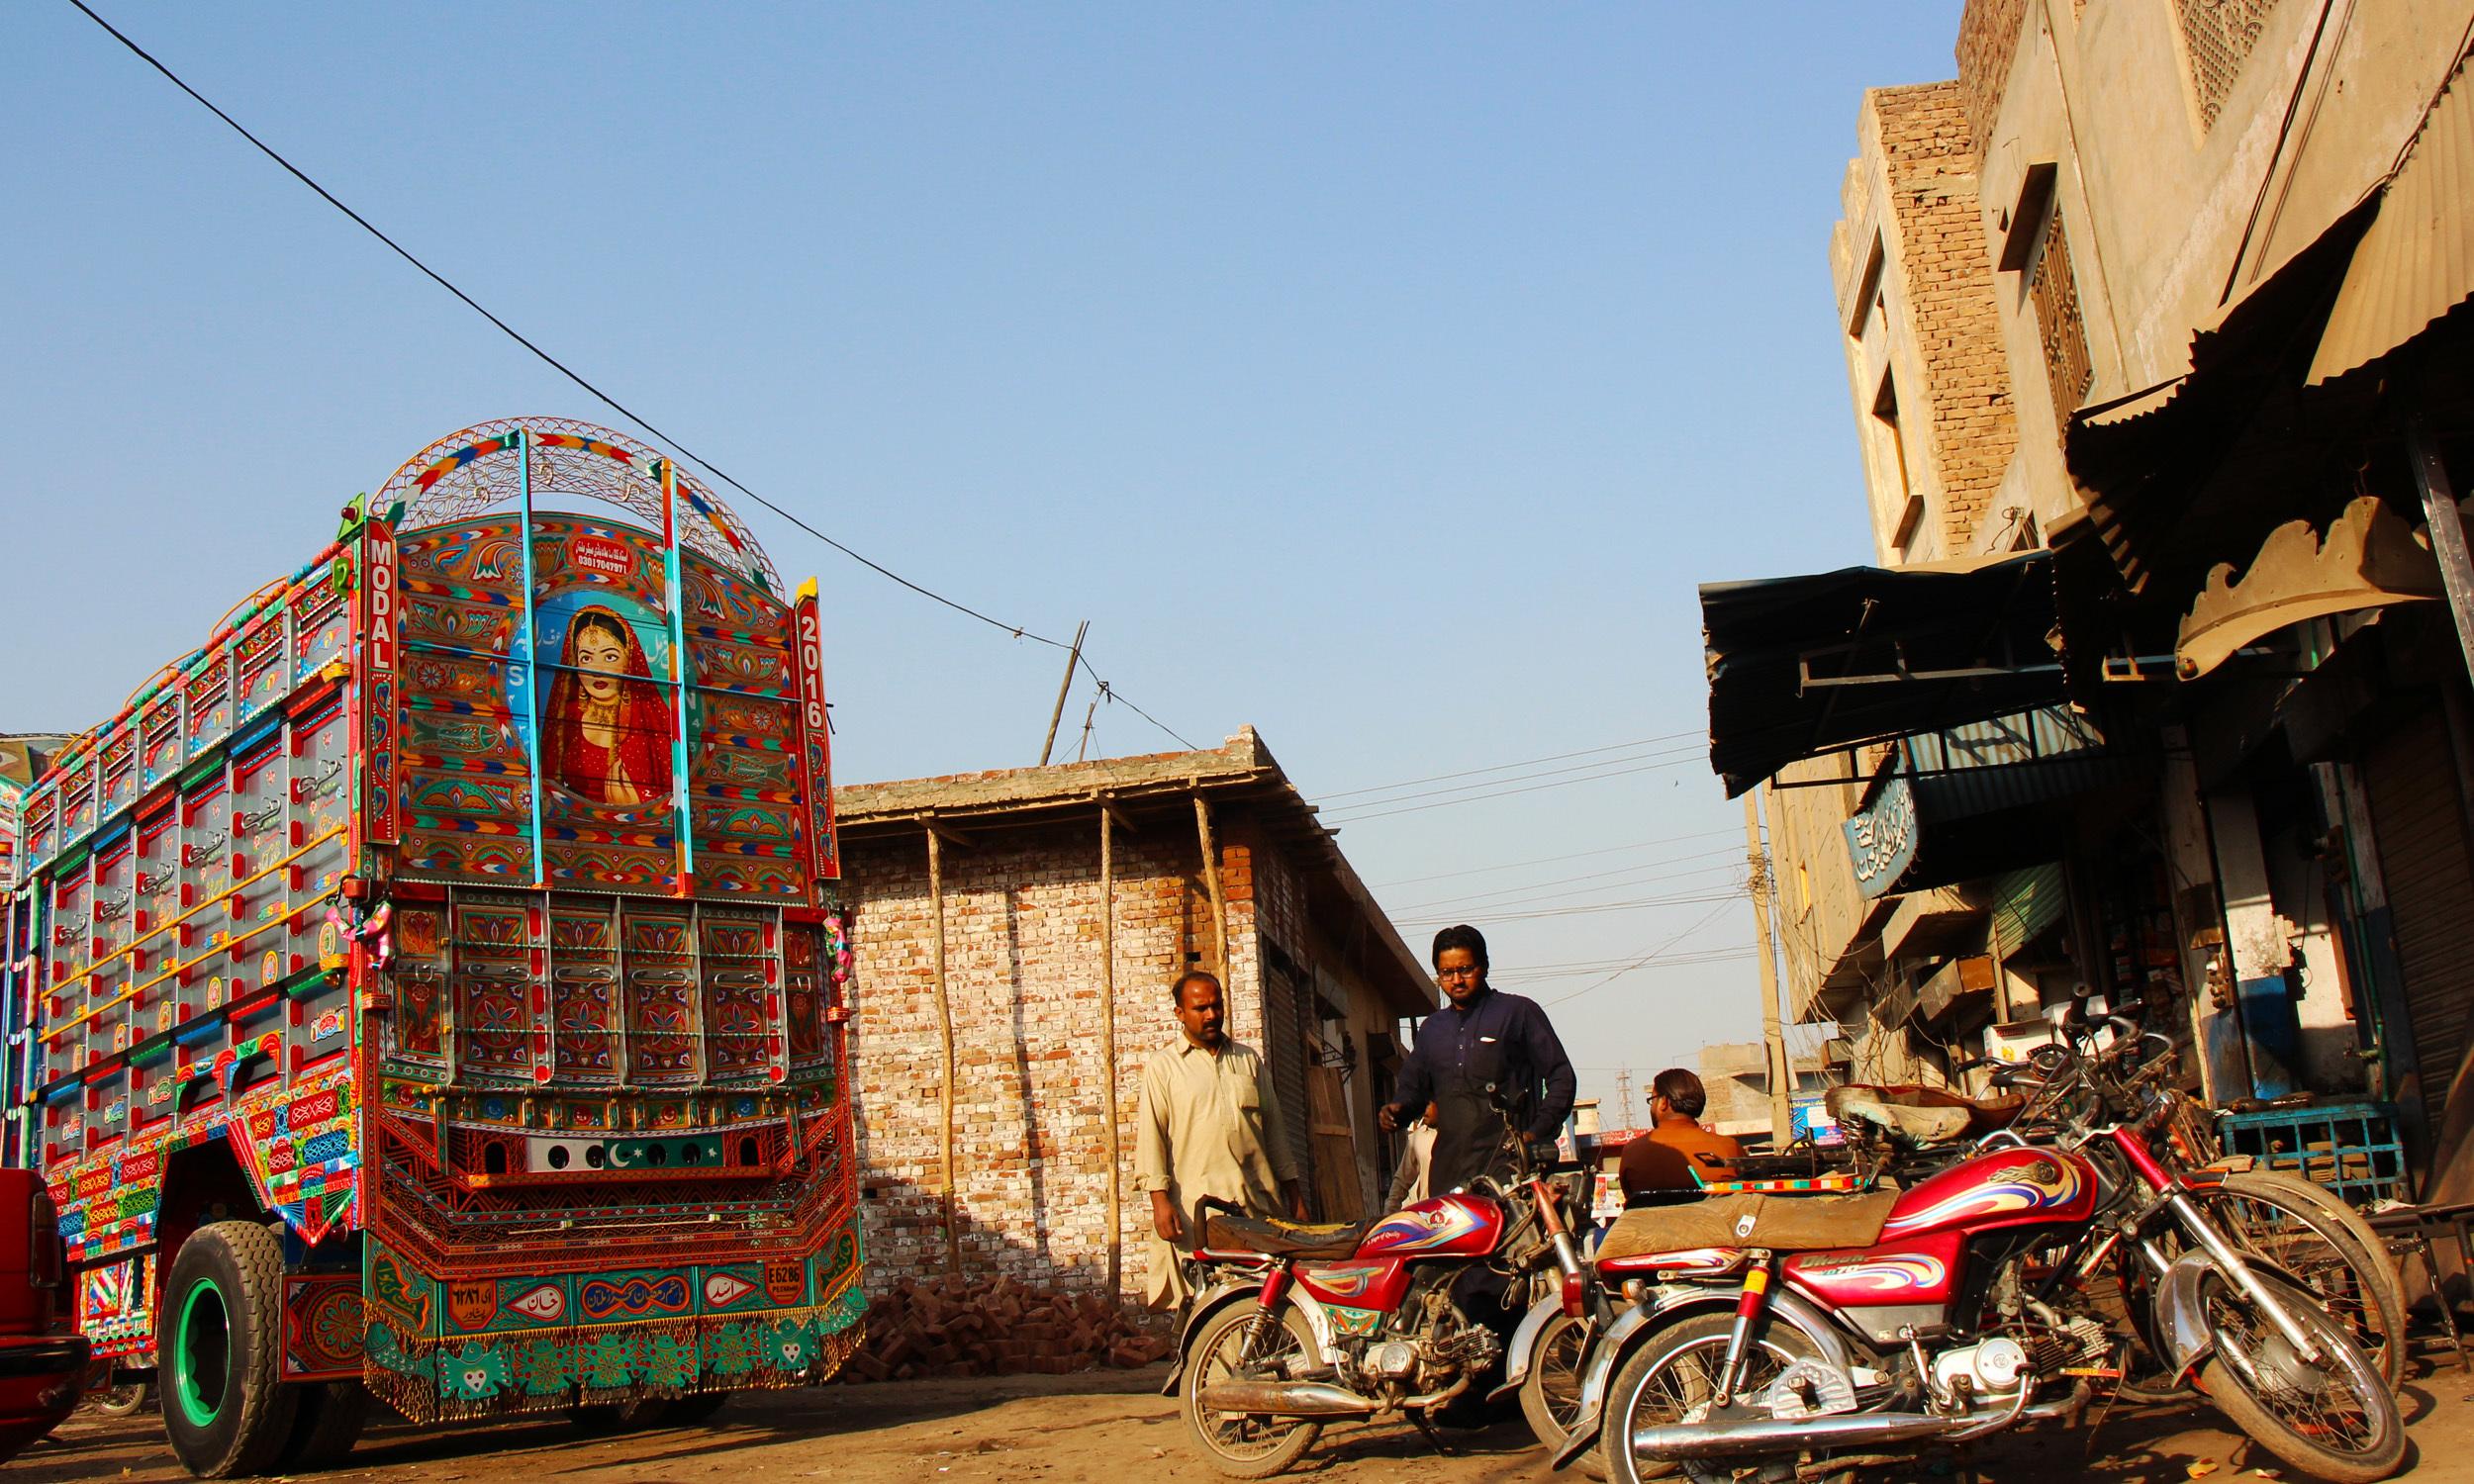 The freshly painted truck stands, Multan